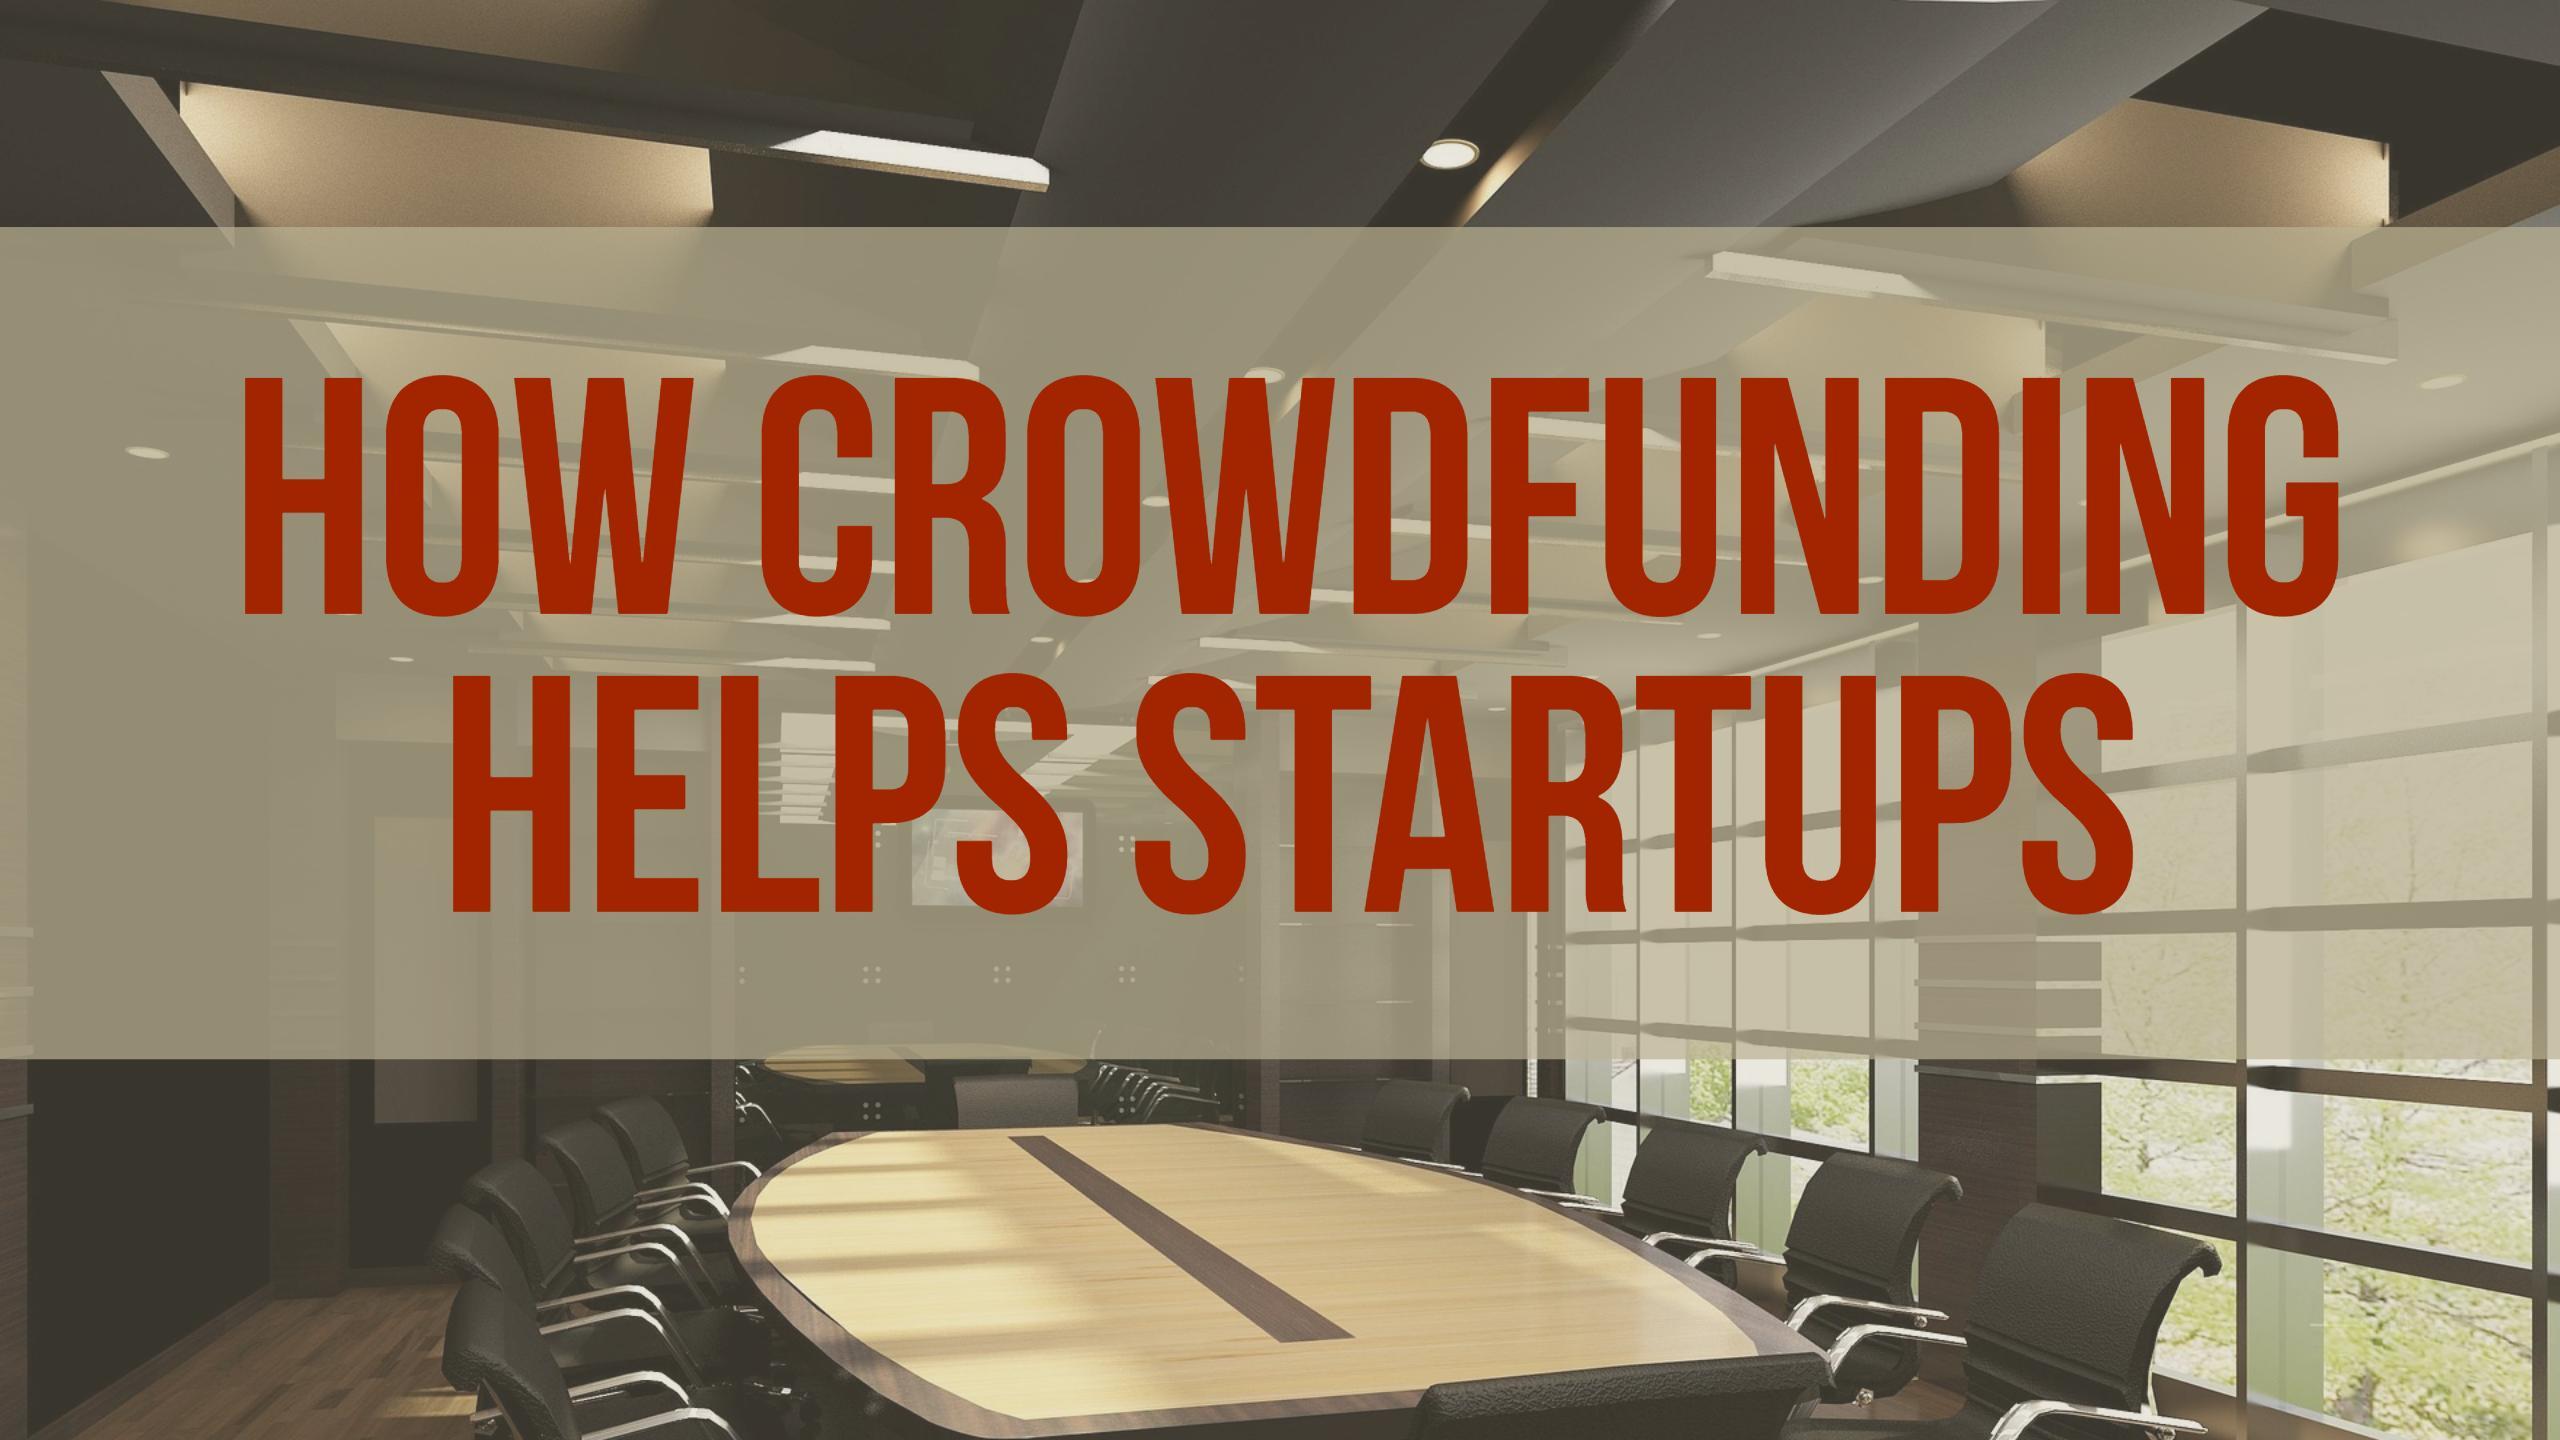 How Crowdfunding Helps Startups